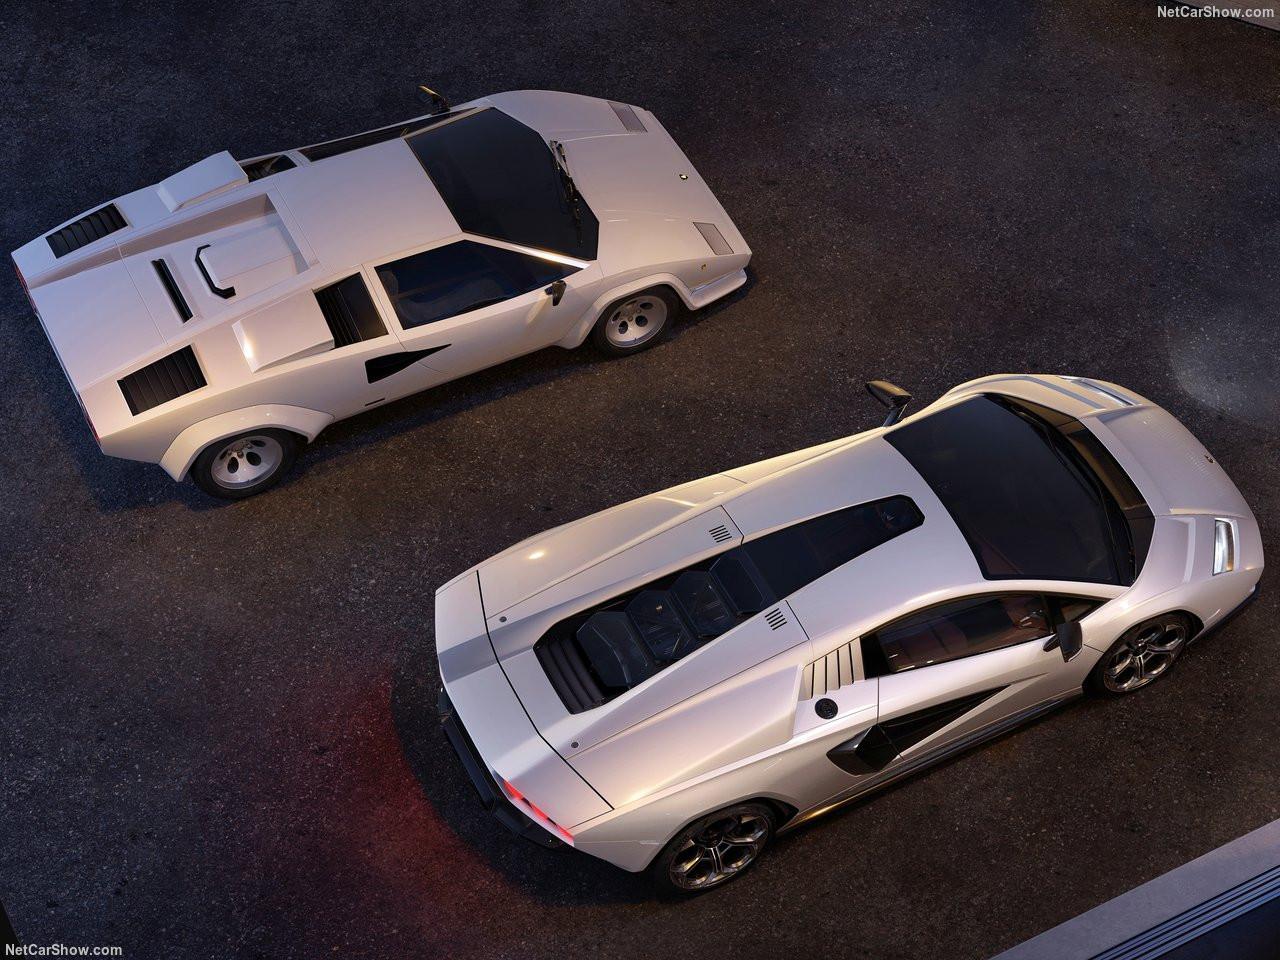 Lamborghini-Countach_LPI_800-4-2022-1280-20.jpg